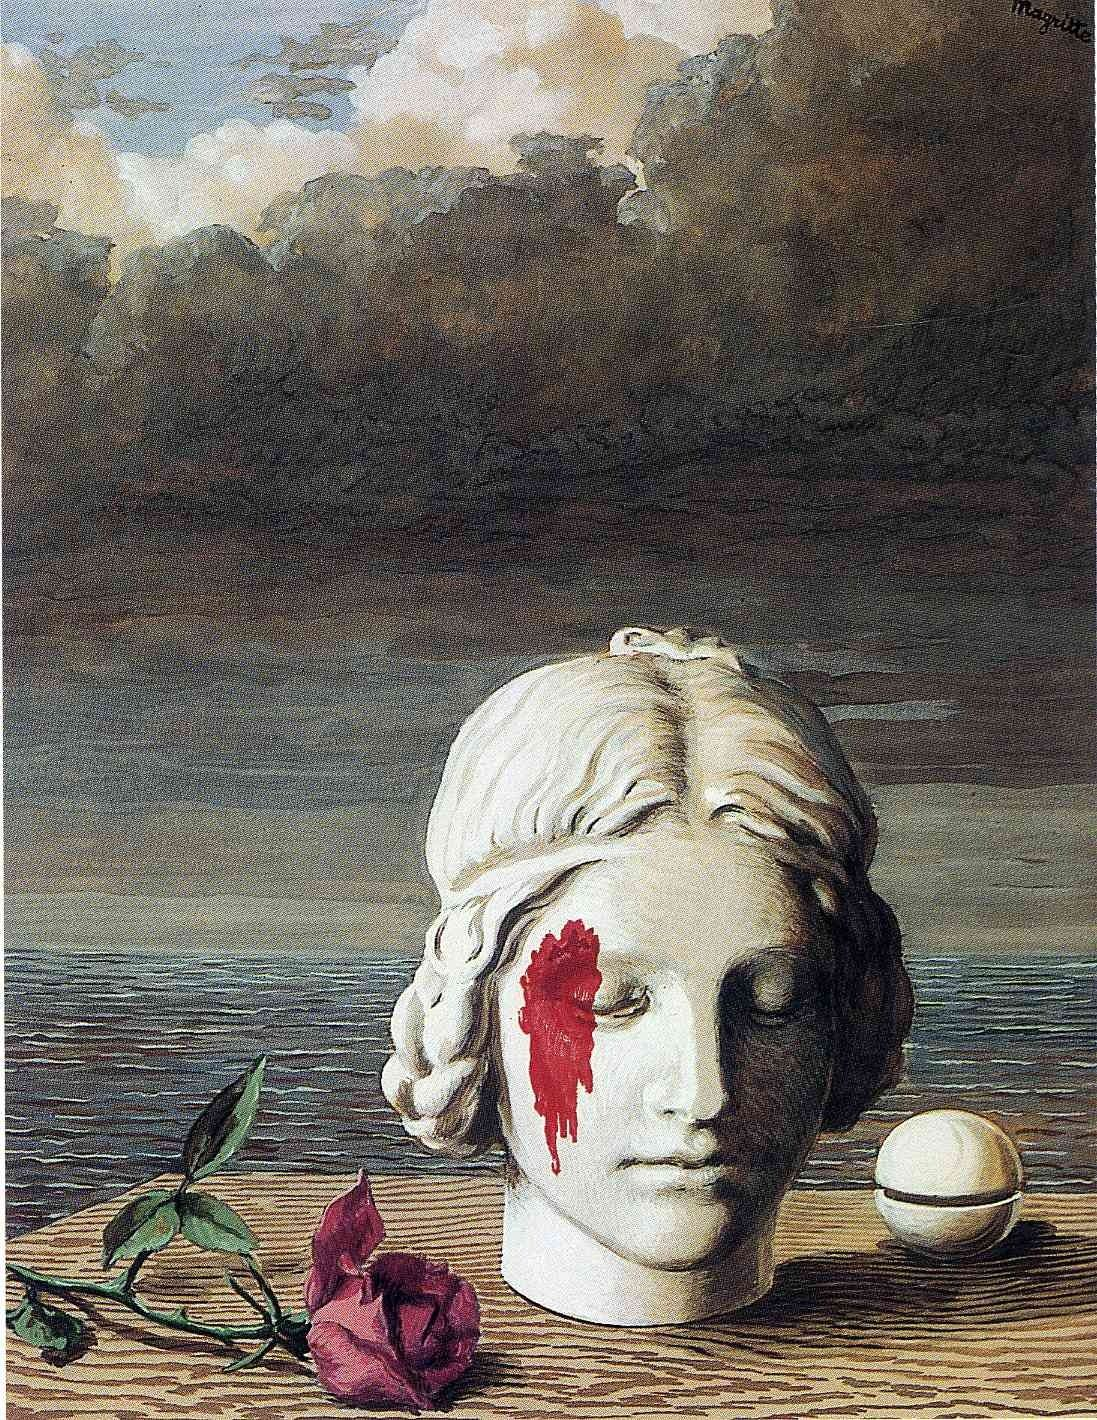 Rene Magritte-La belle saison-2013 Poster